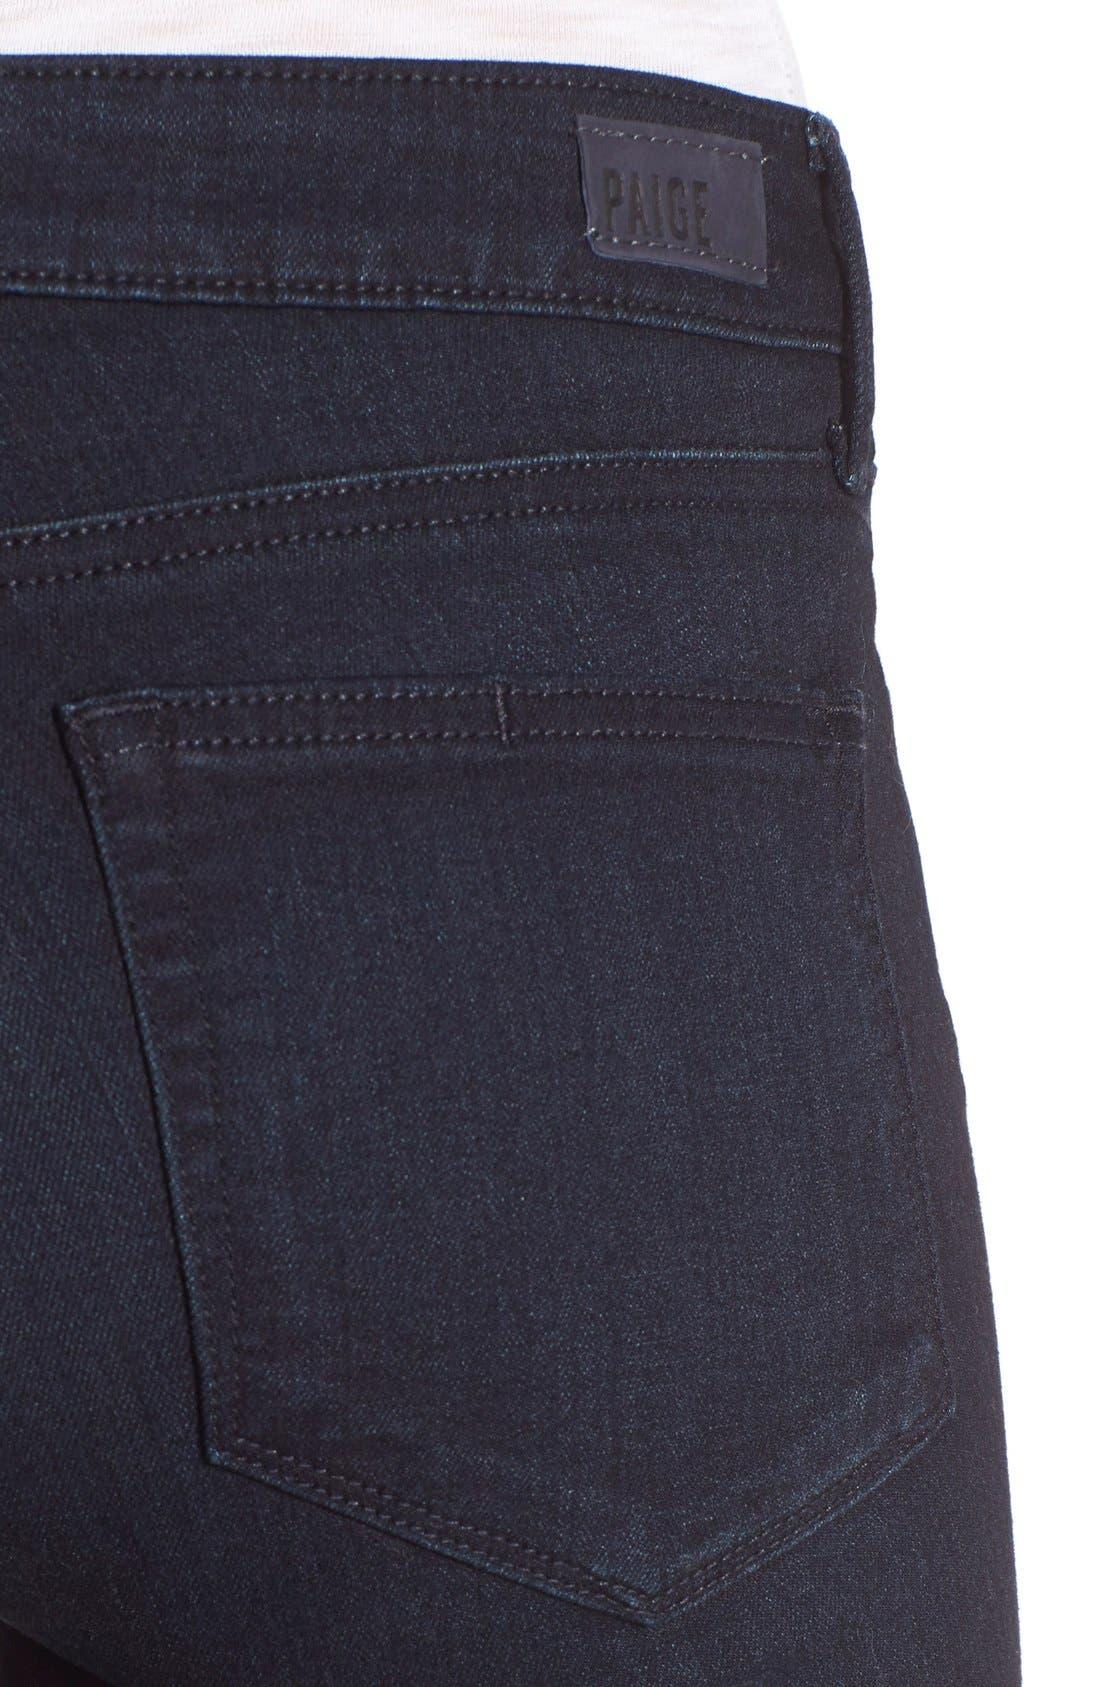 Denim 'Verdugo' Ultra Skinny Jeans,                             Alternate thumbnail 4, color,                             400